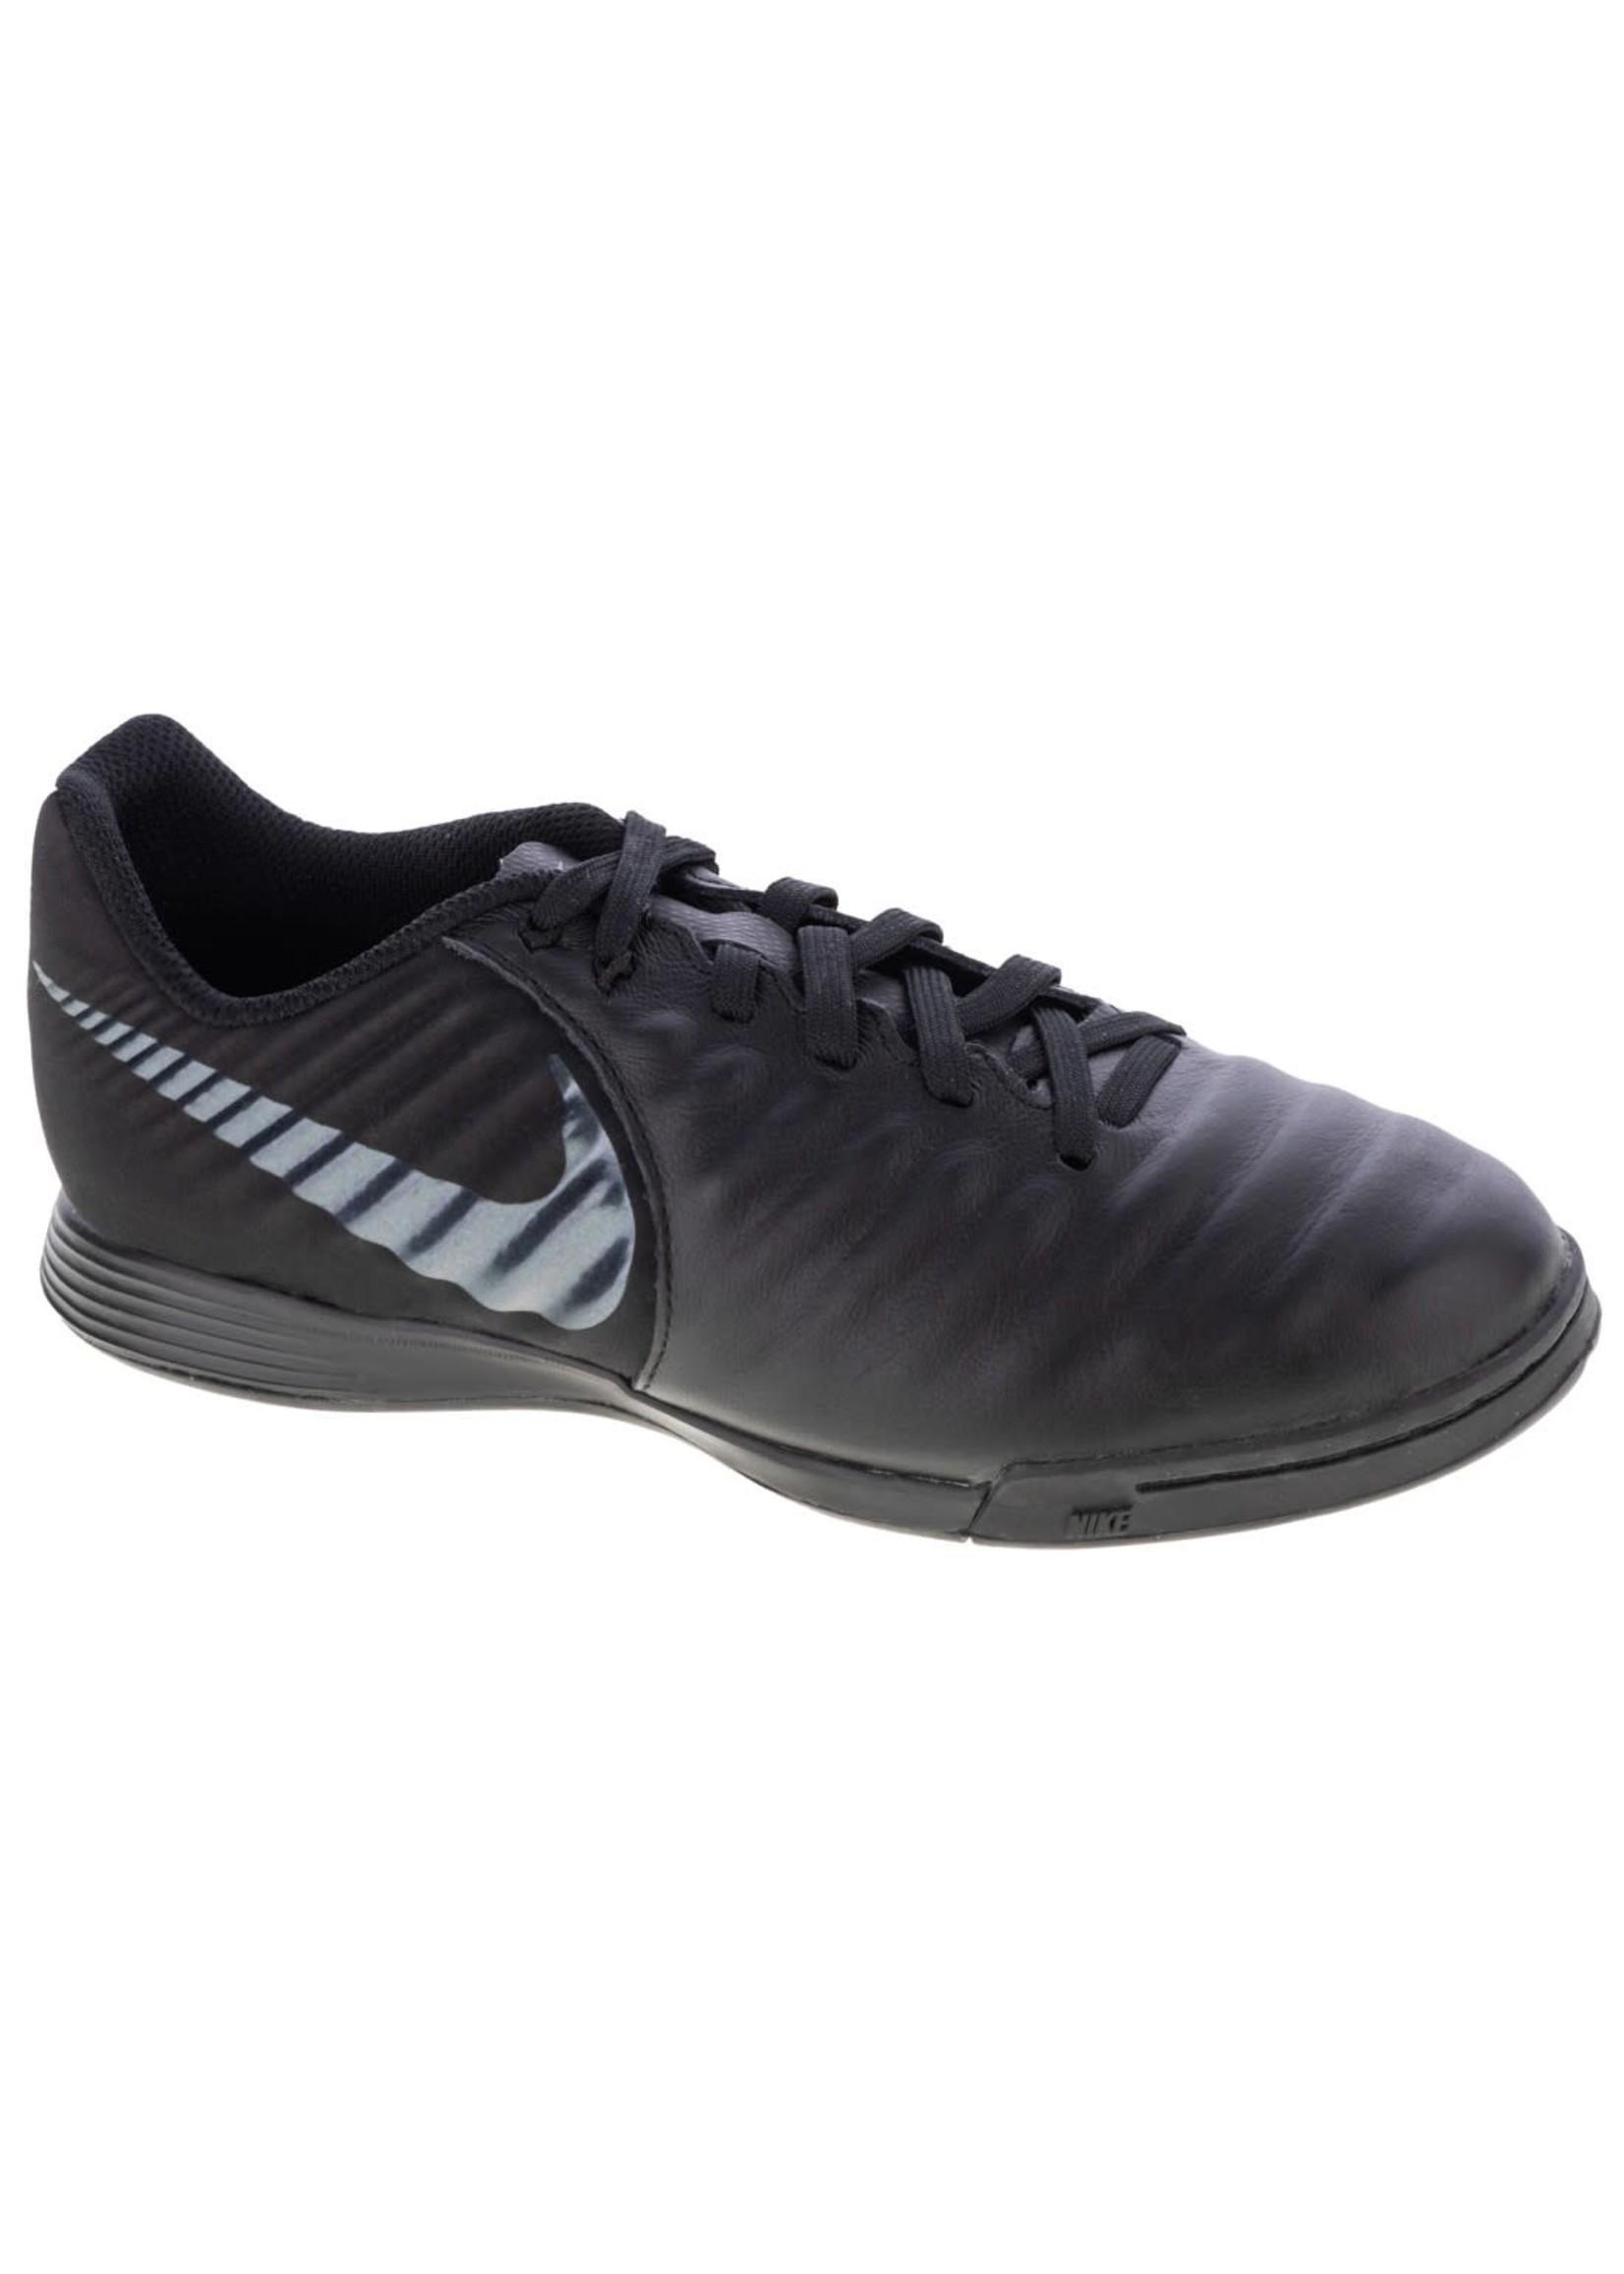 Nike Jr Legend 7 Academy IC - Black/Black